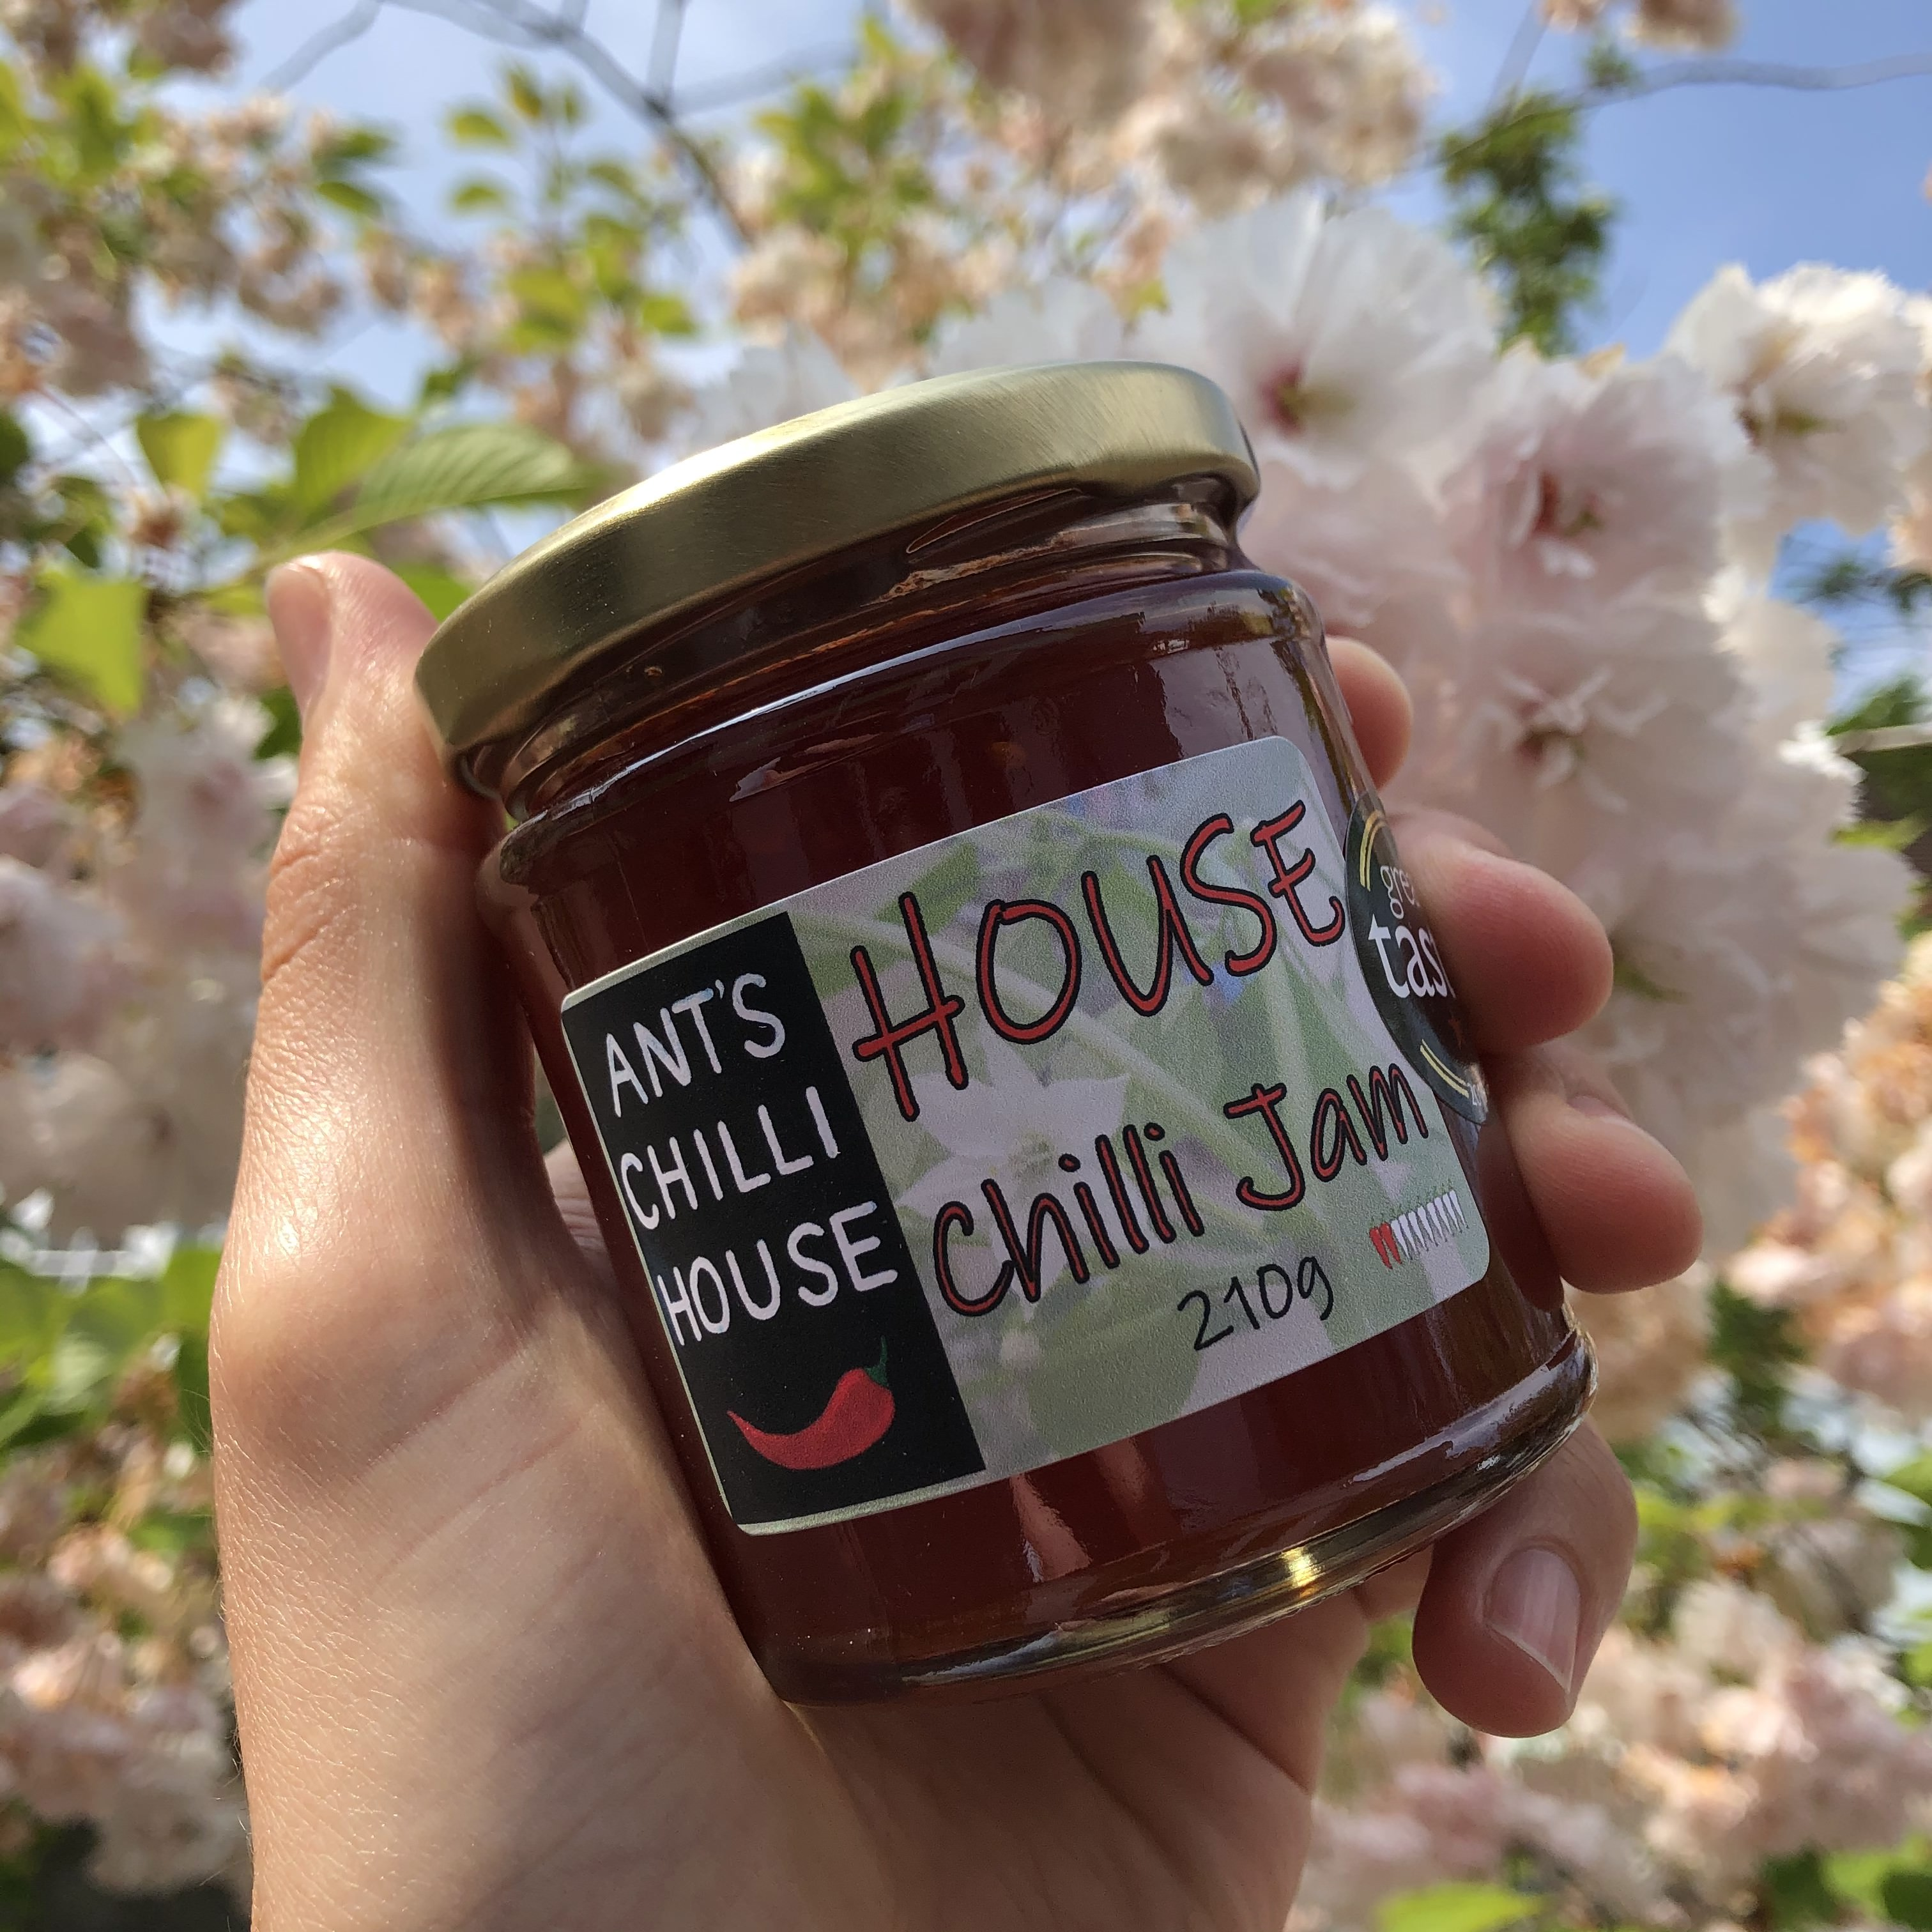 Ants Chilli House - House Chilli Jam 210g